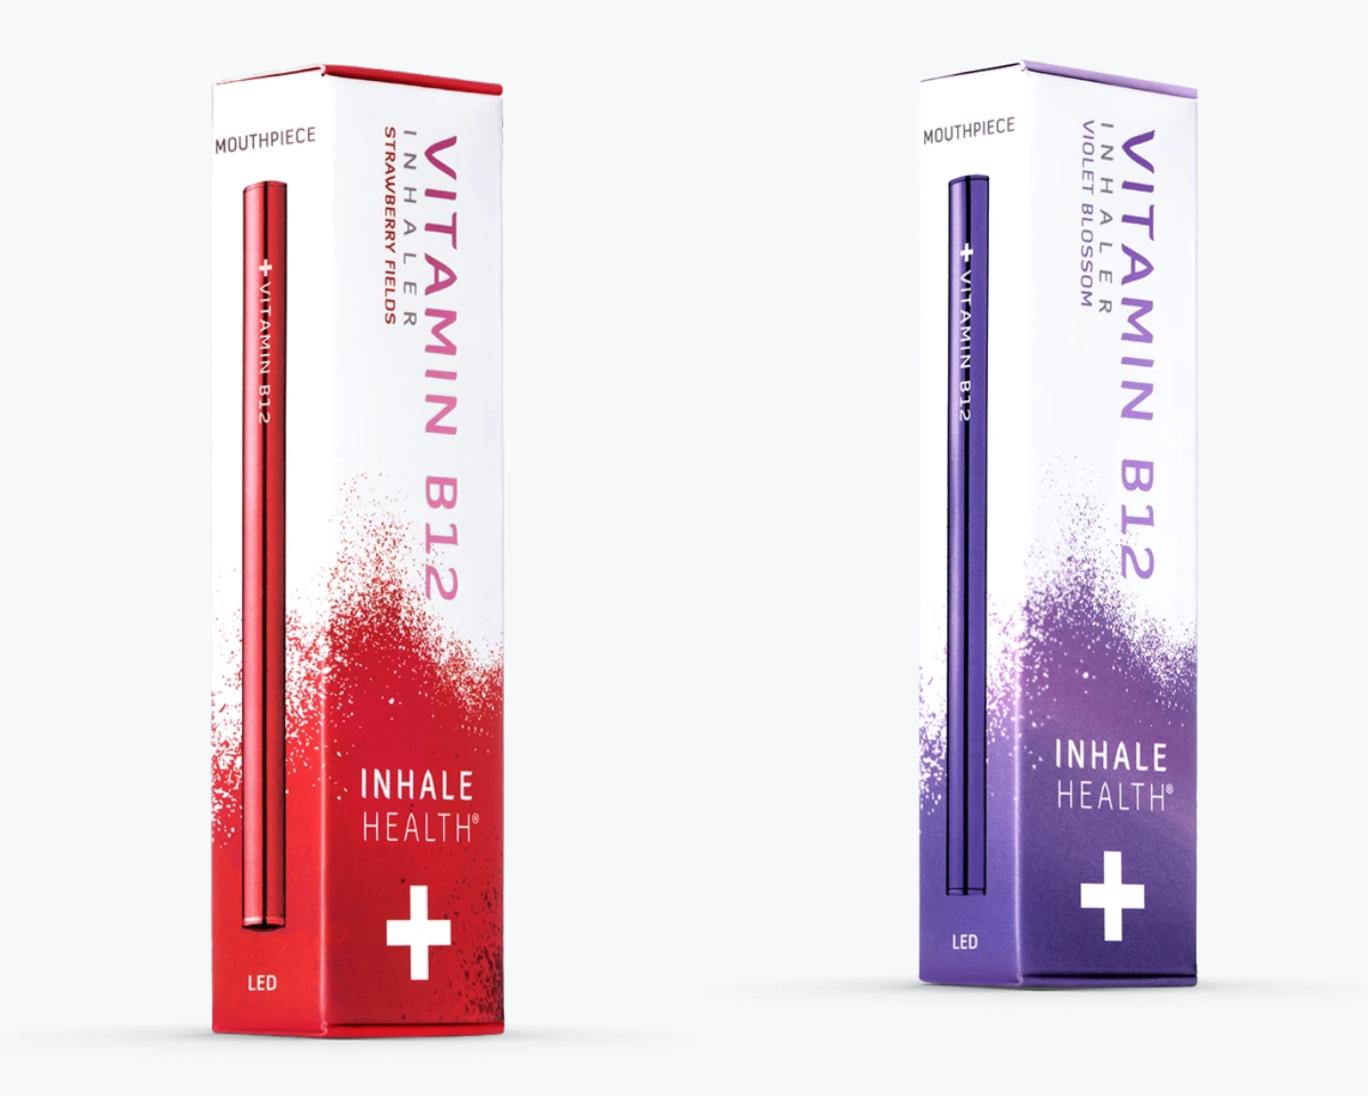 Can You Vape Vitamins? We Review Inhale Health's Vape Pens...